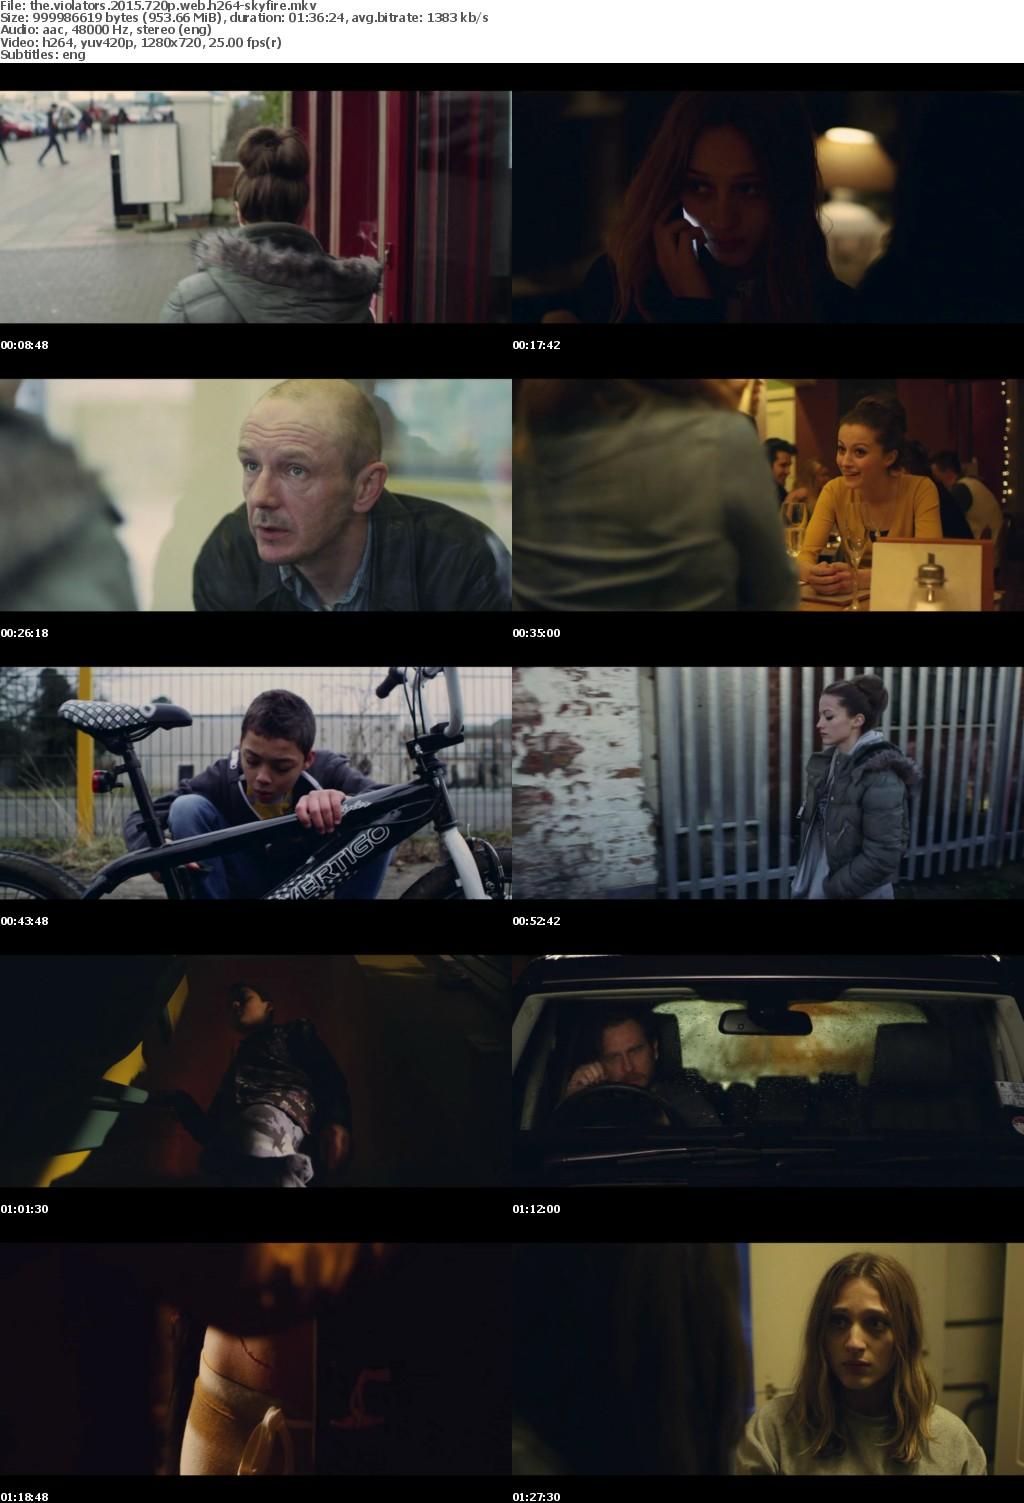 The Violators 2015 720p WEB H264-SKYFiRE